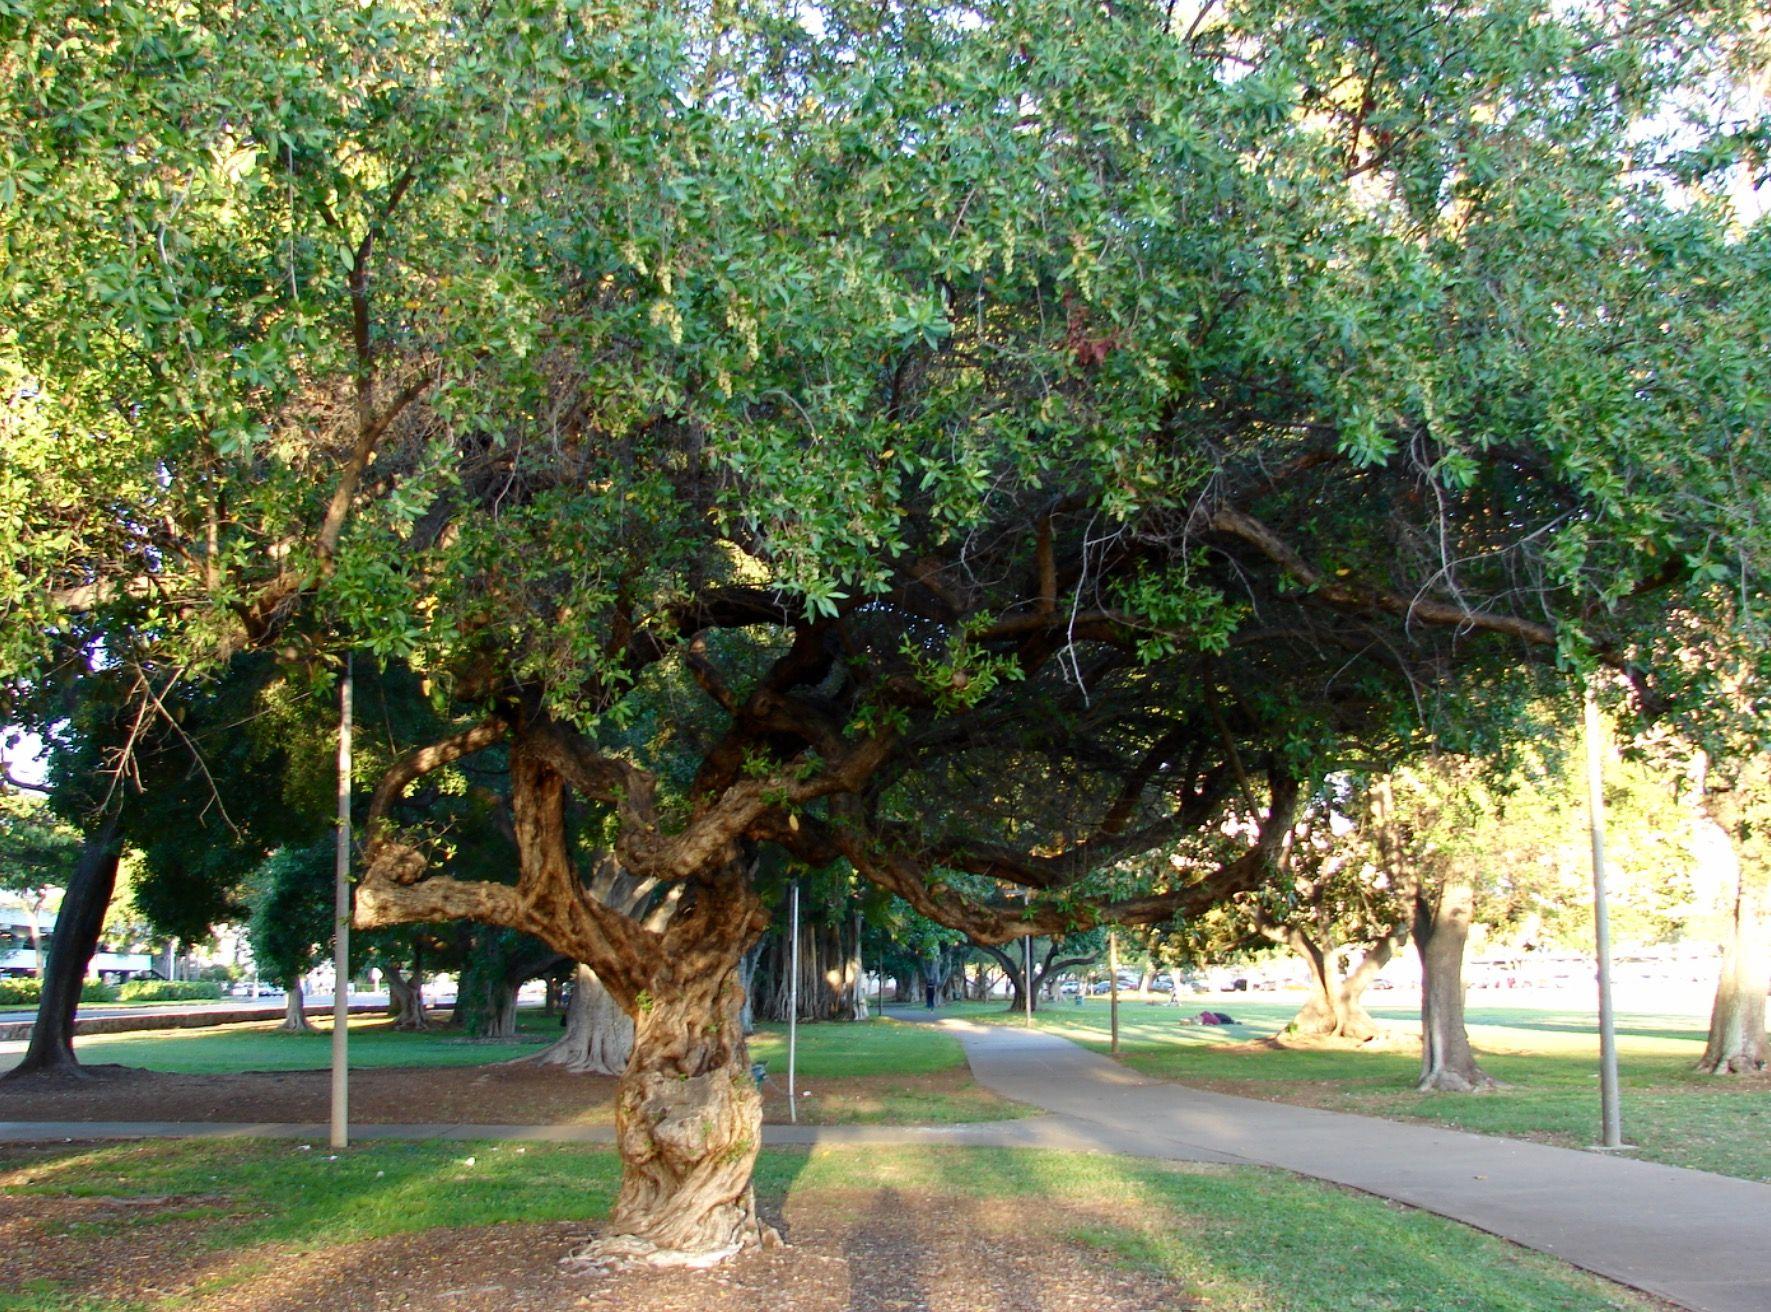 Conocarpus Erectus (Buttonwood) Canopy Tree, Many Uses For Its Wood